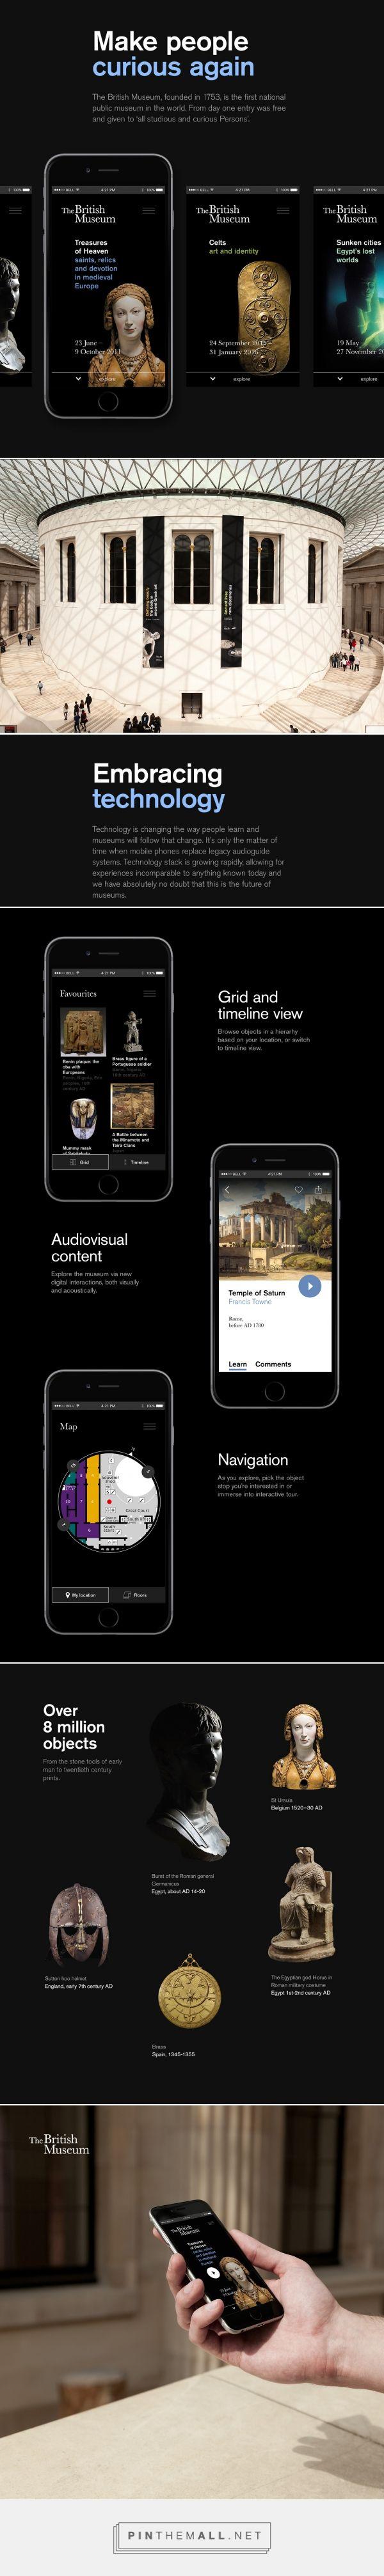 British Museum - iOS App Concept   Abduzeedo Design Inspiration - created via https://pinthemall.net